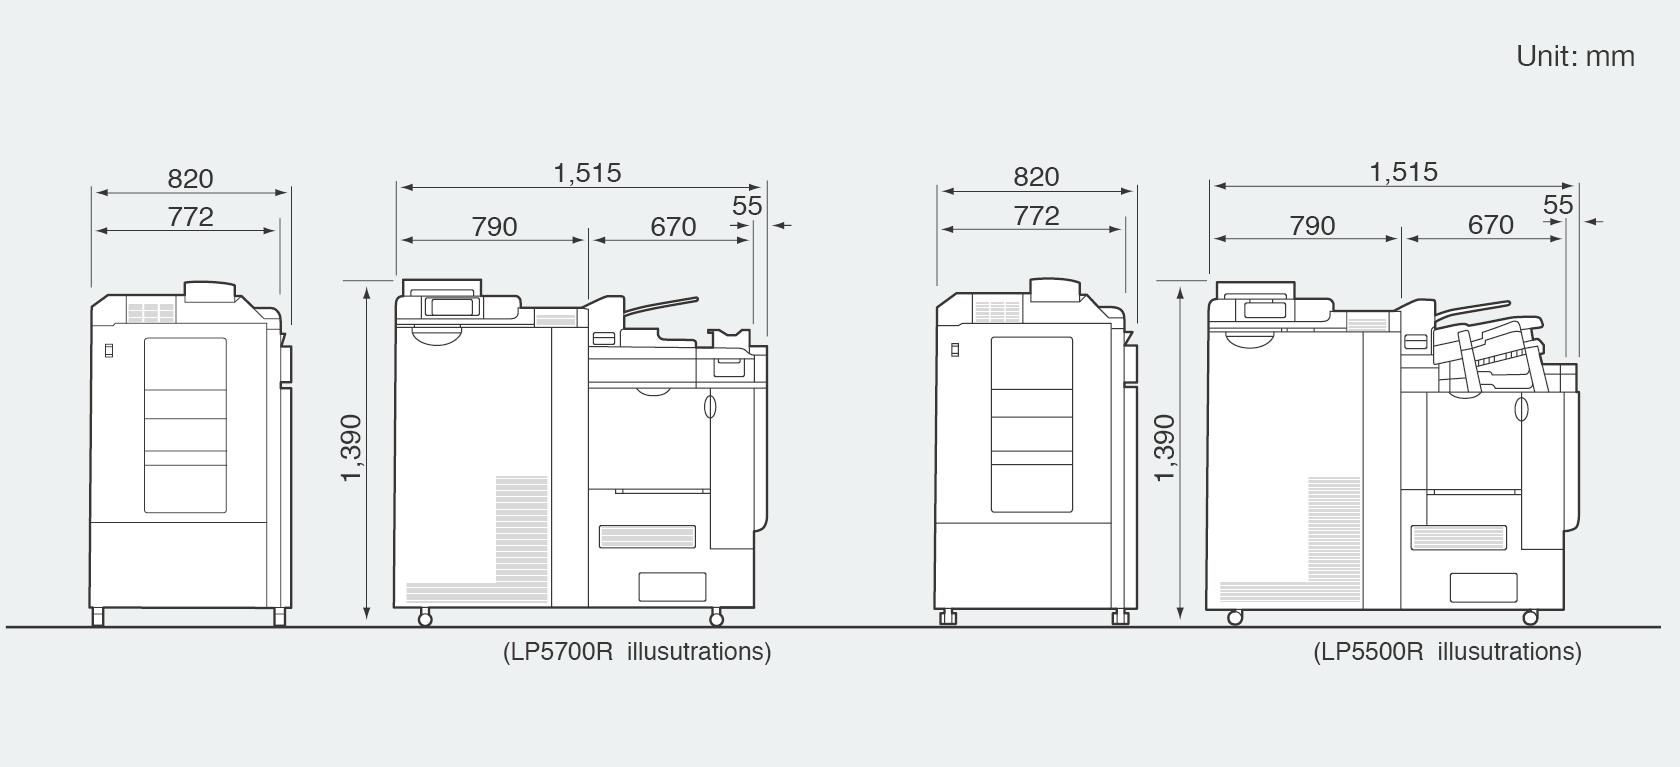 [image] Digital Minilab Frontier LP5700R/LP5500R dimensions